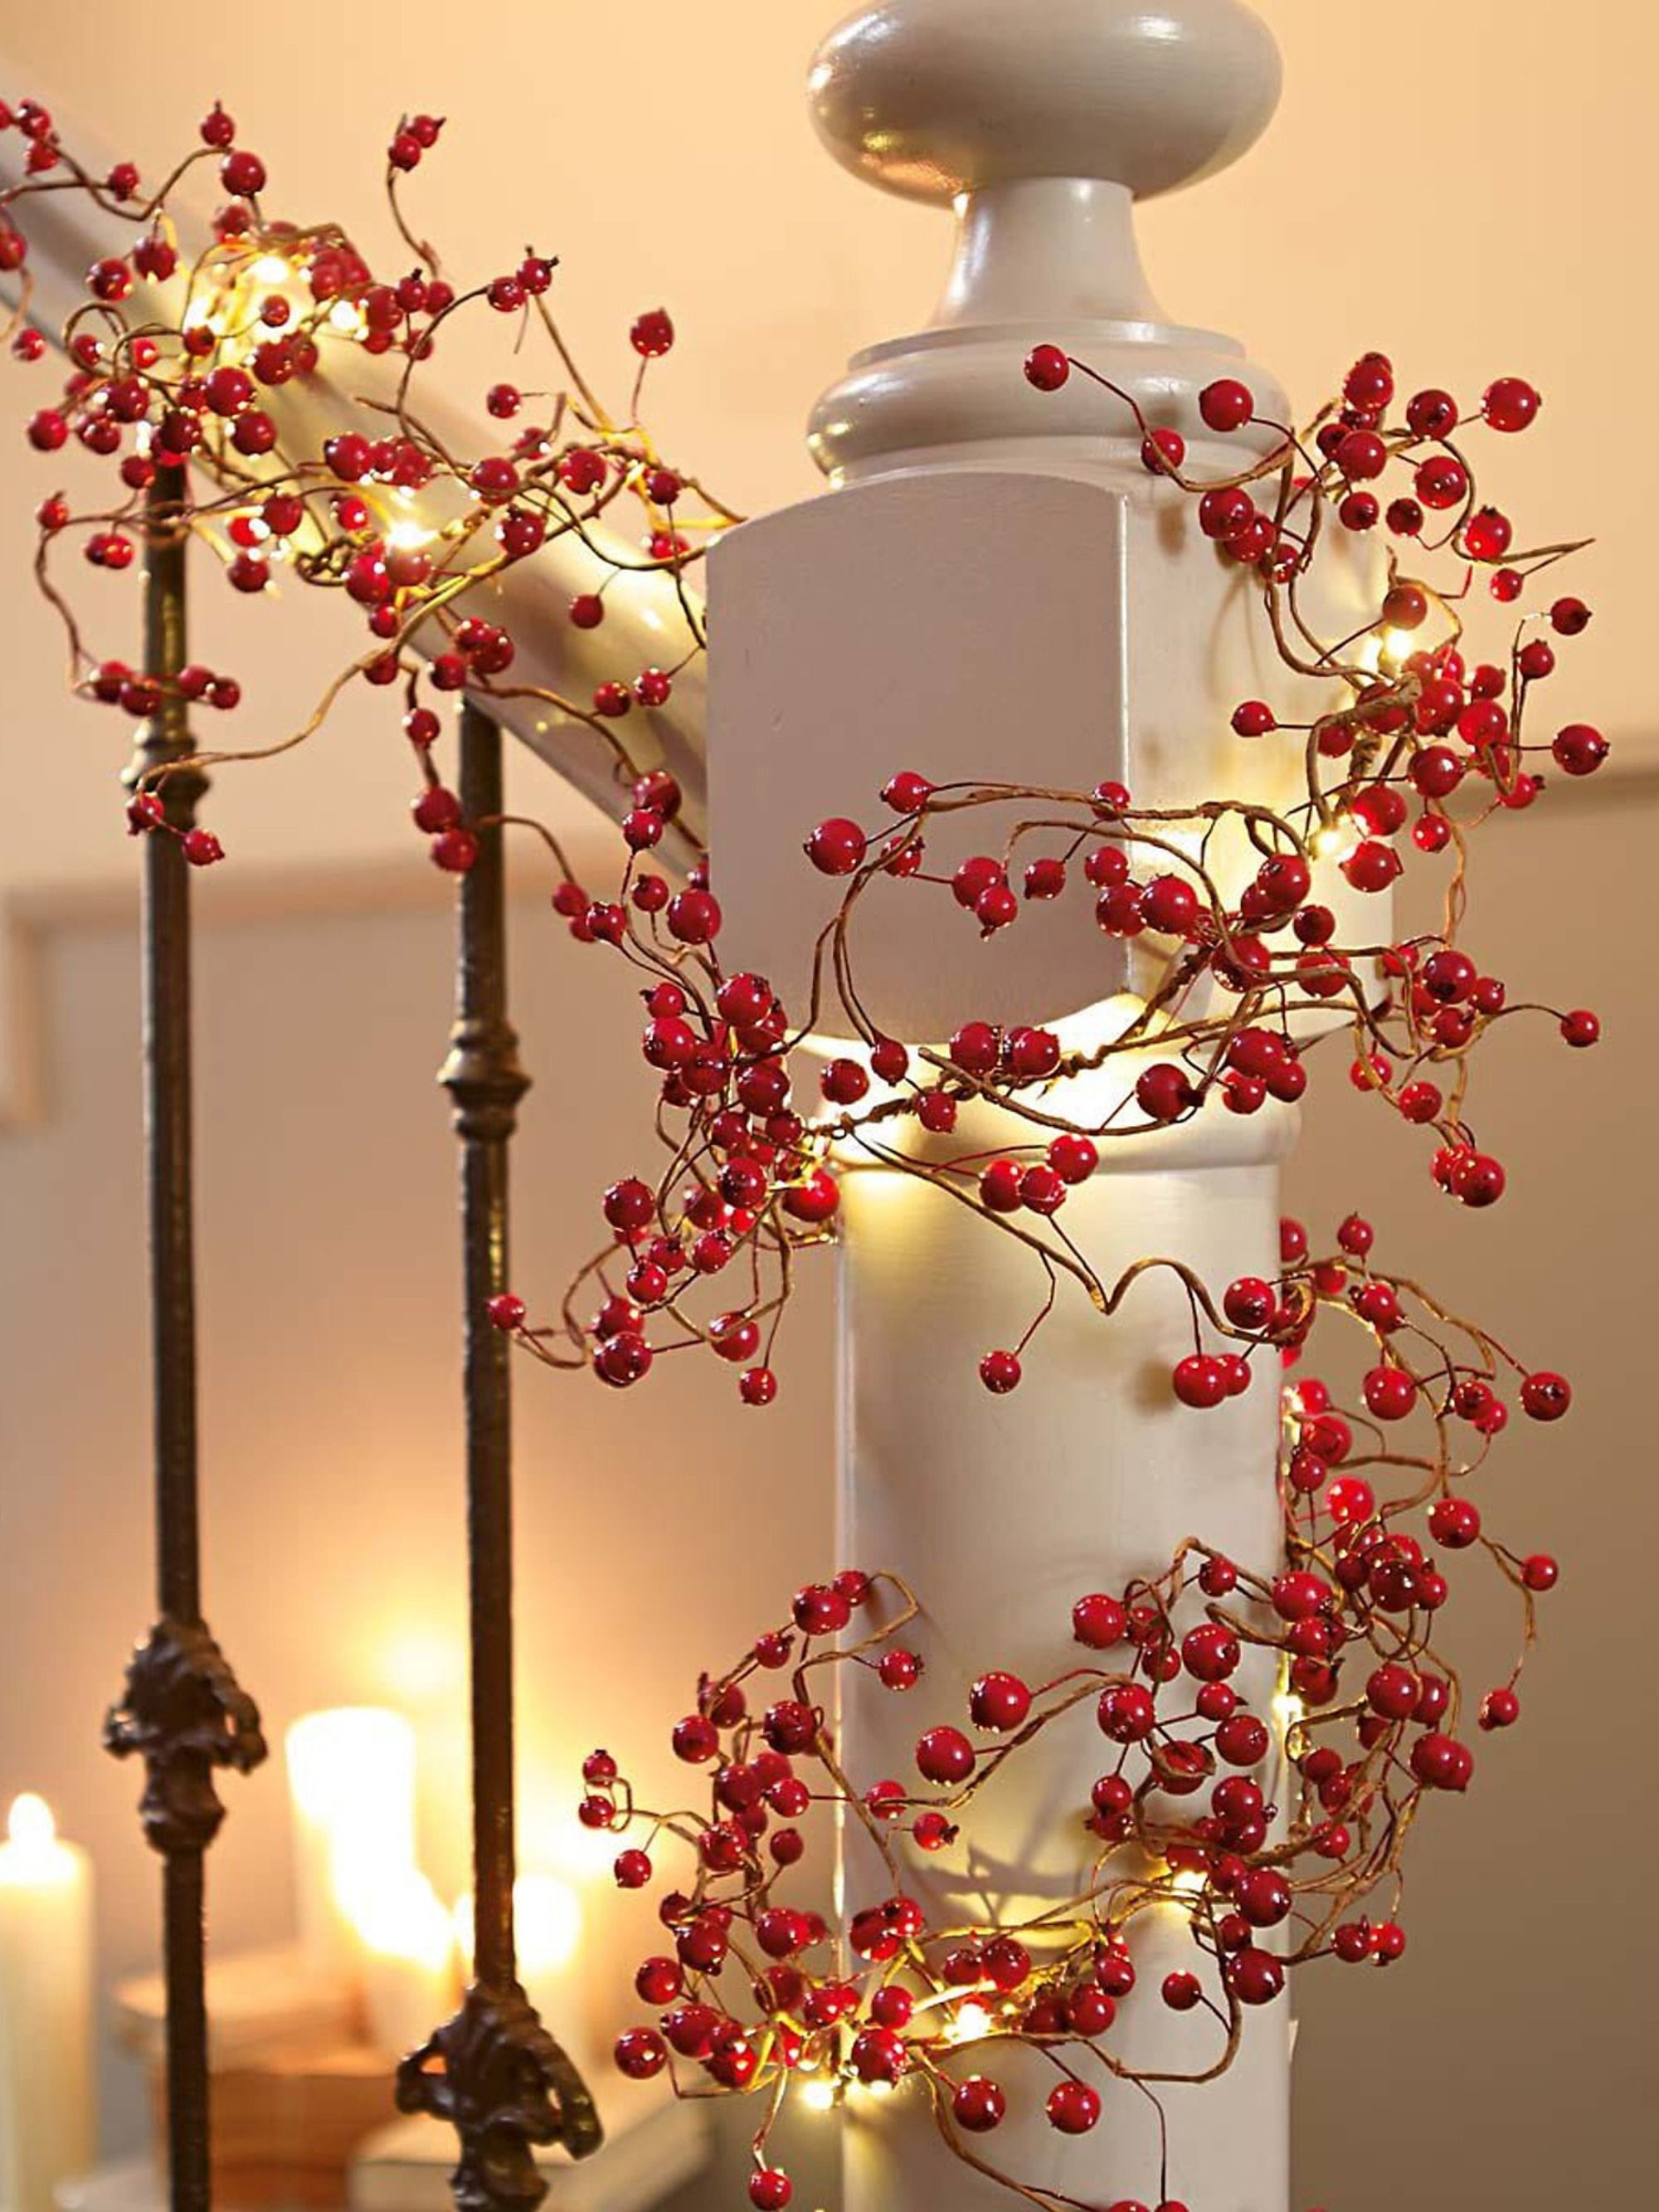 Lichterkette Girlande Rote Beeren #garlandofflowers